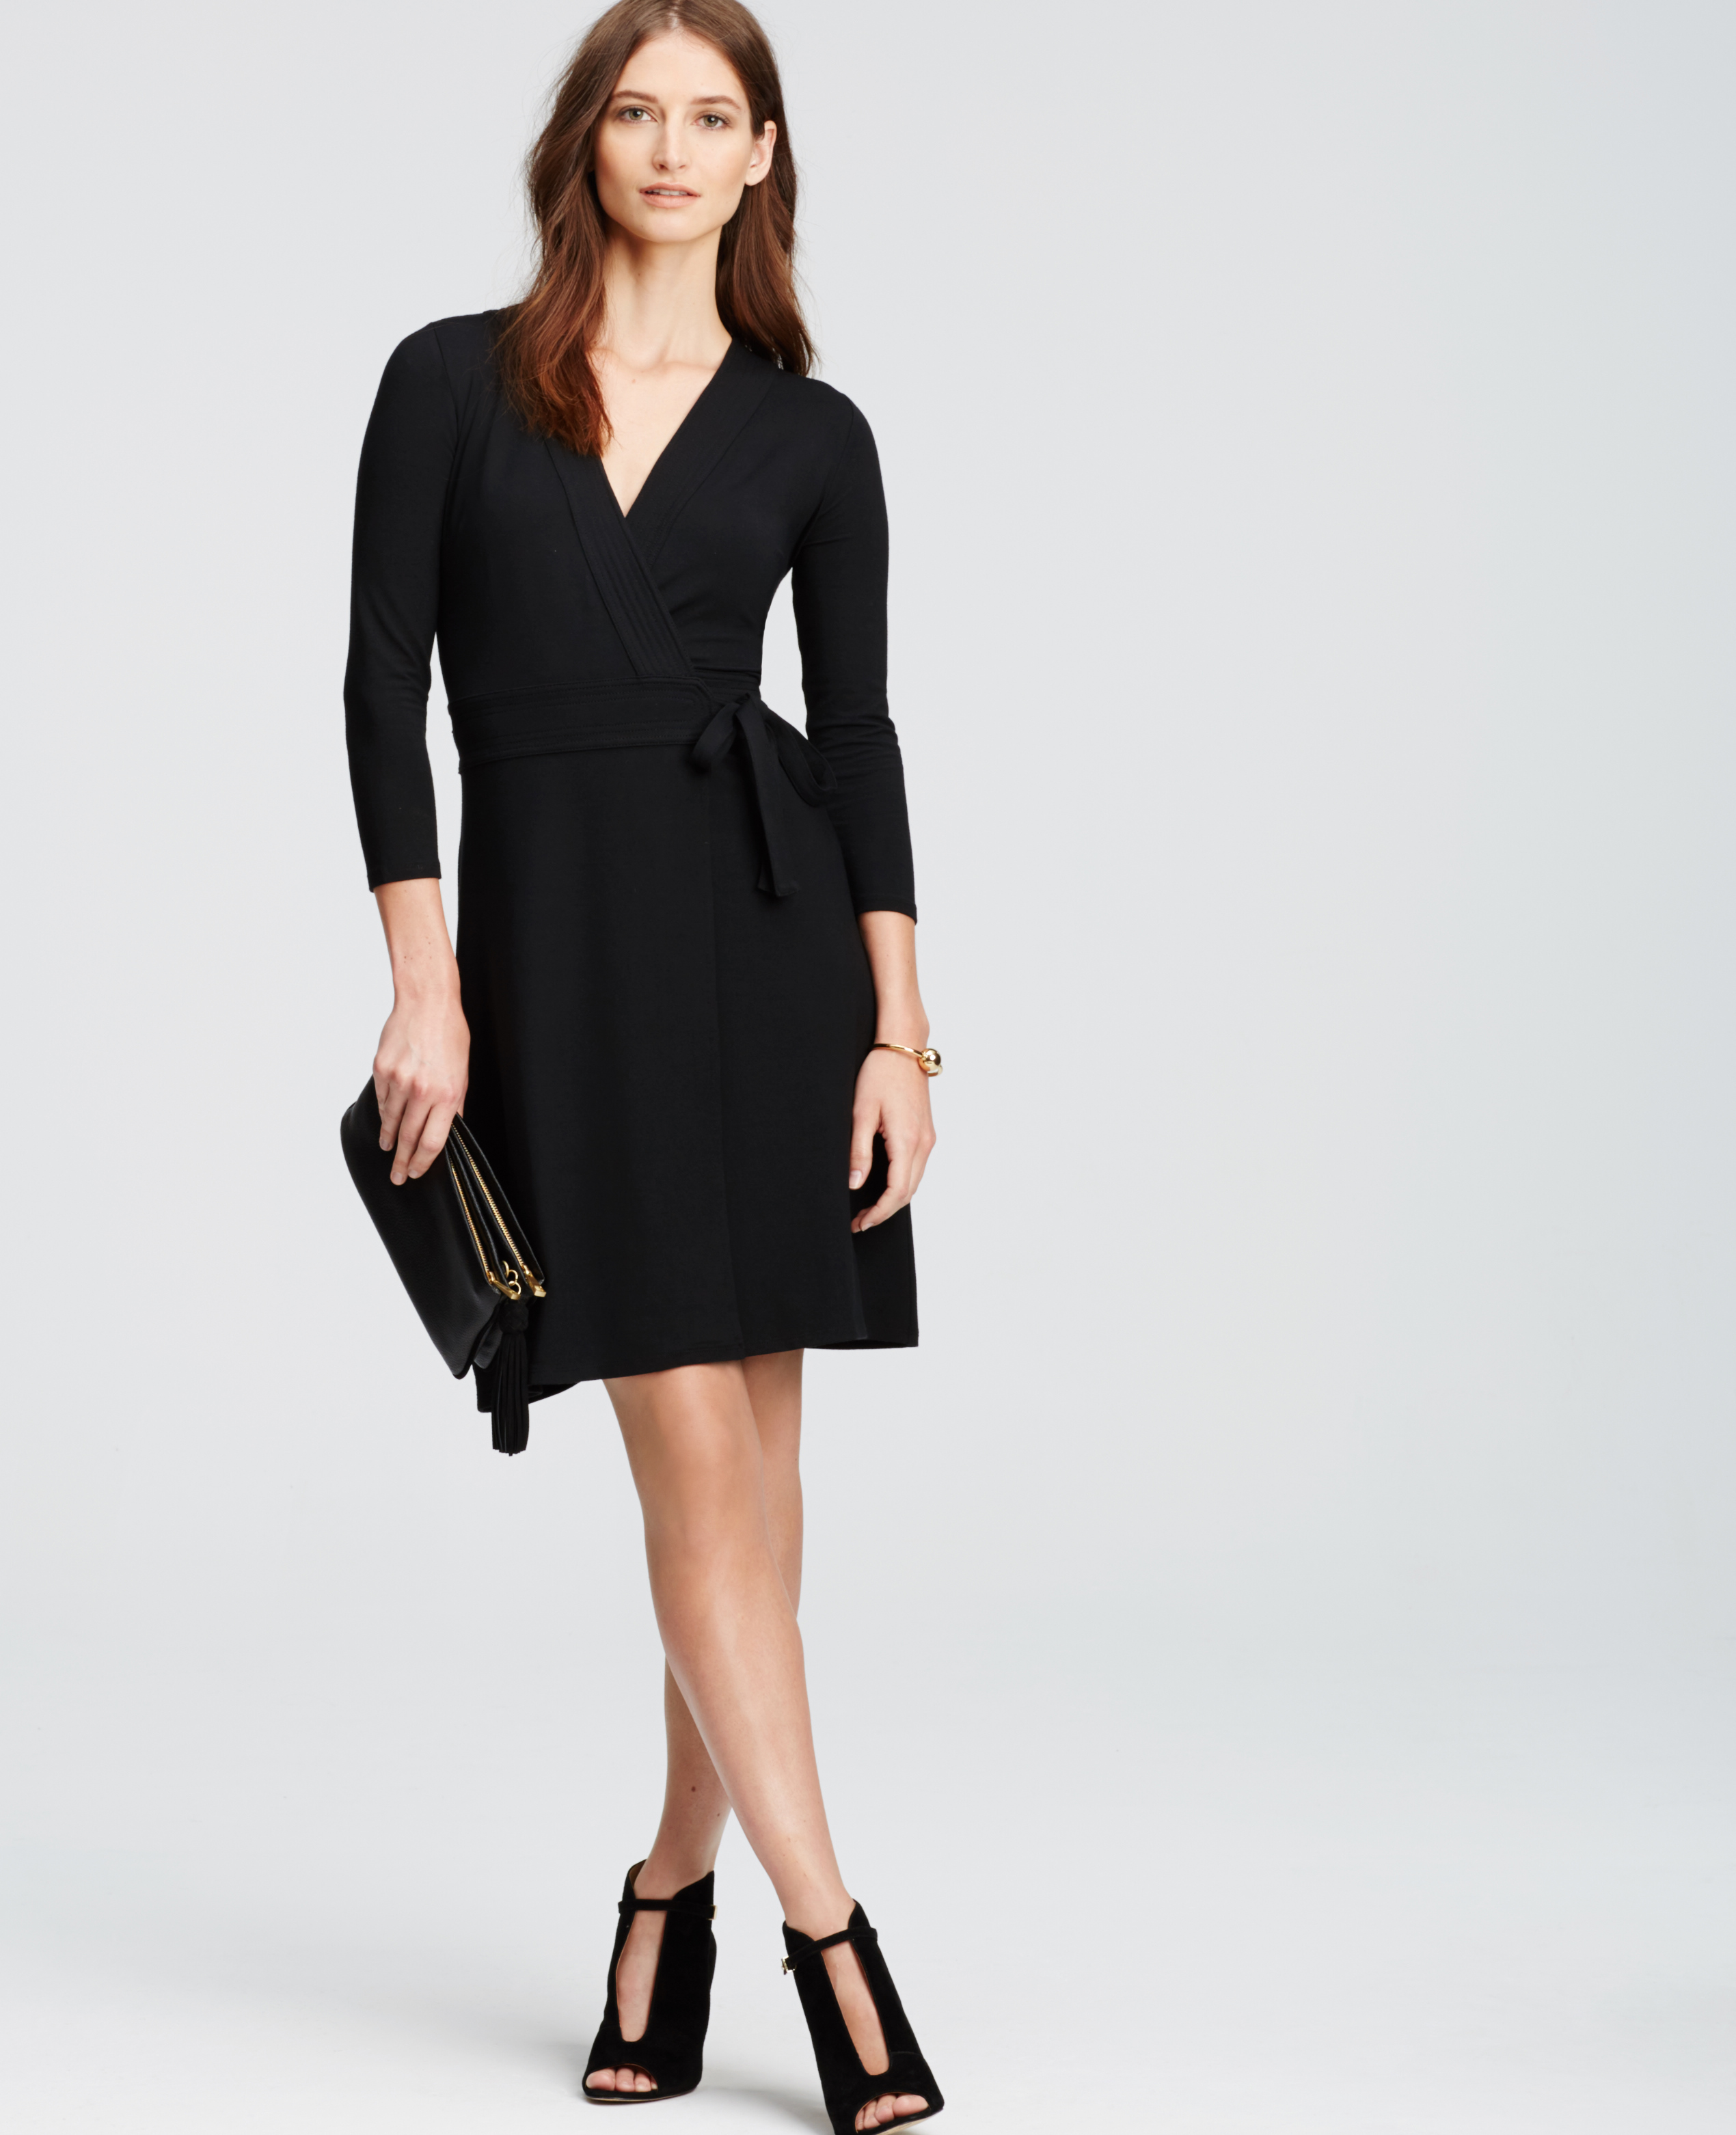 f0a41d6bcaf Ann Taylor Petite 3/4 Sleeve Wrap Dress in Black - Lyst